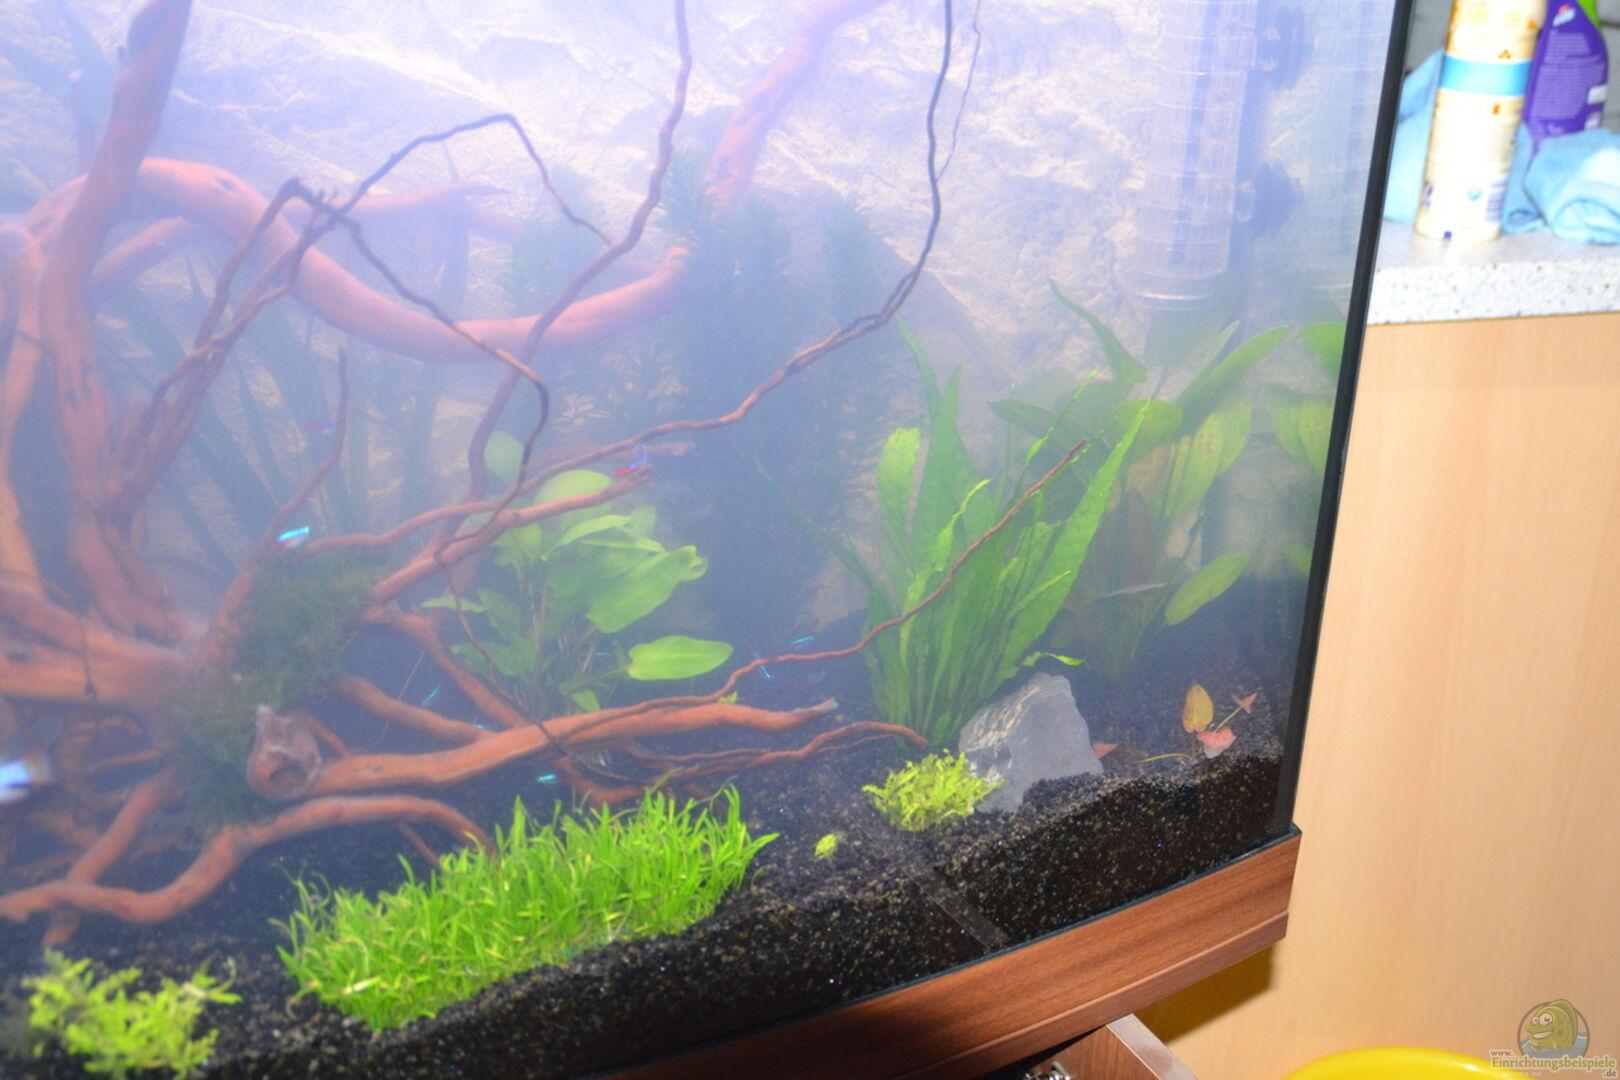 pflanzen im aquarium juwel vision 260 aus juwel vision 260. Black Bedroom Furniture Sets. Home Design Ideas